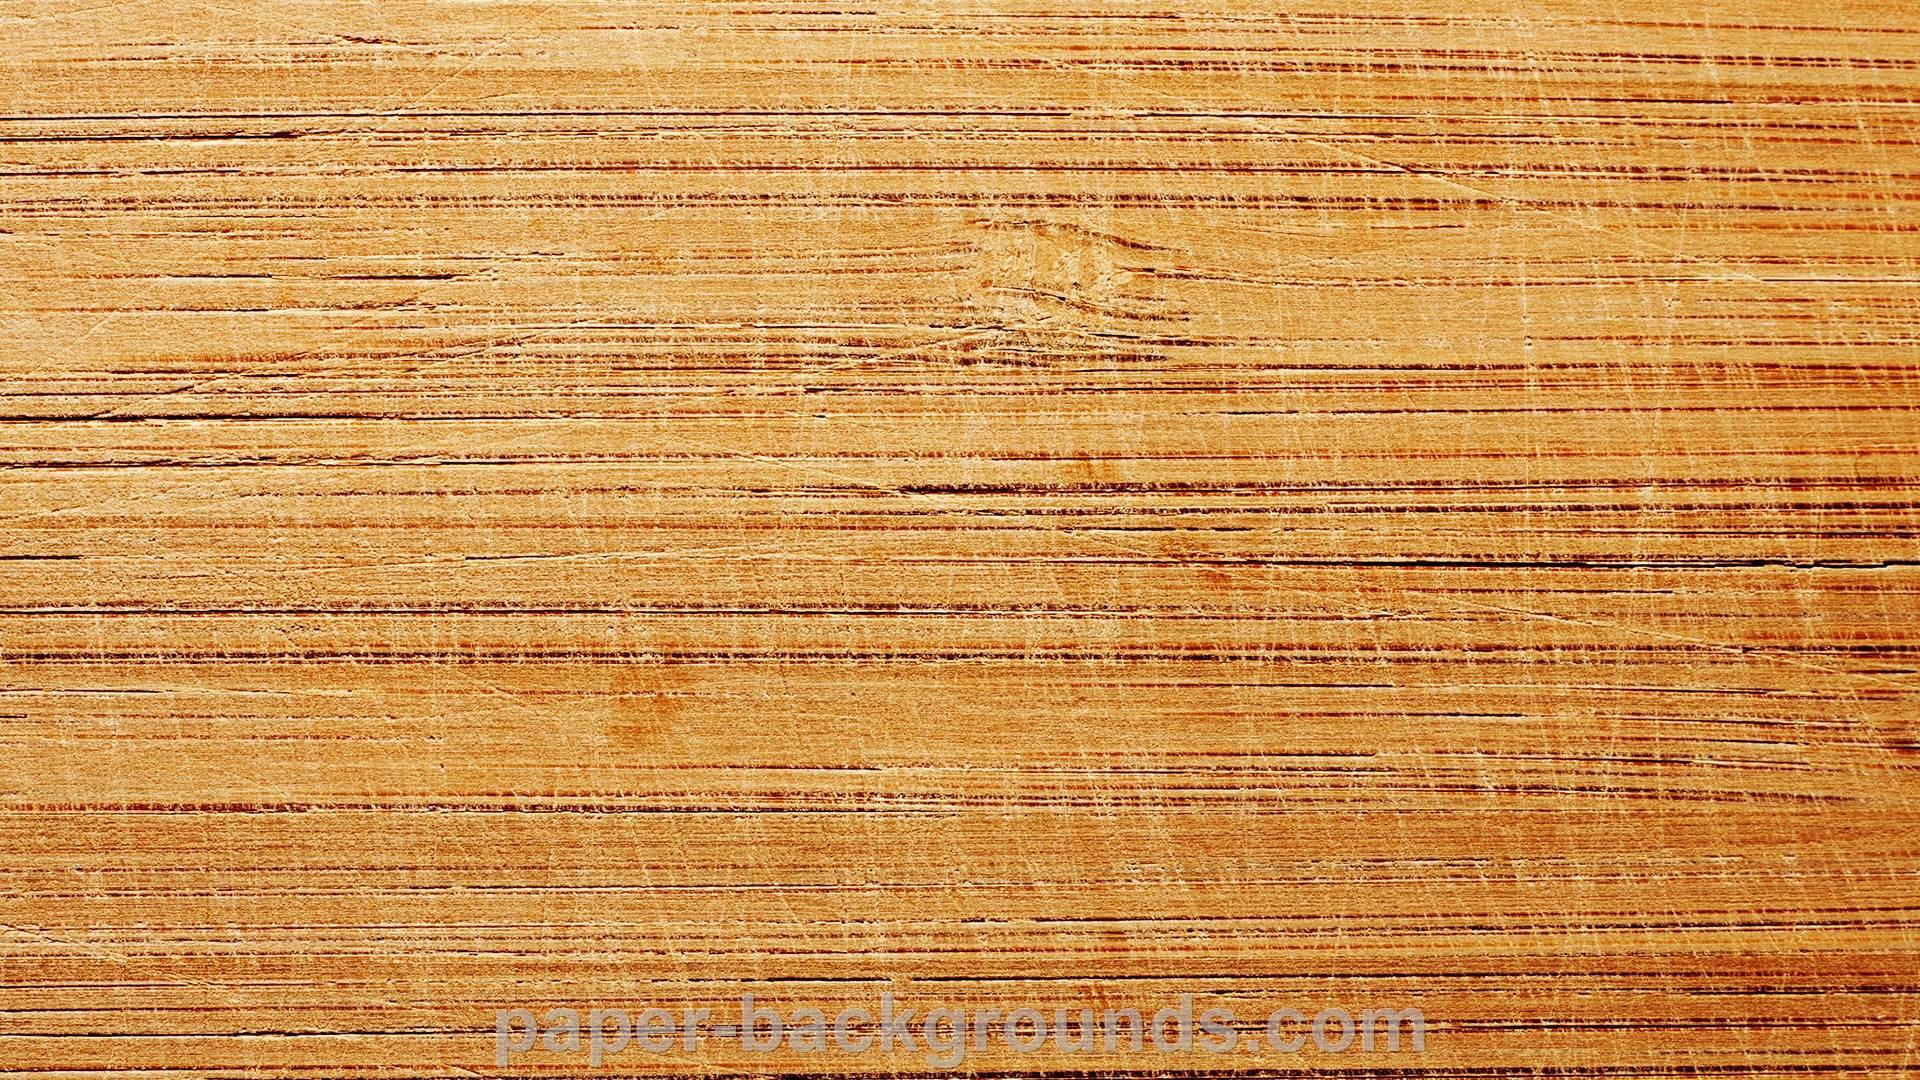 Brown Wood Background Stock Wallpaper 1920x1080 | Hot HD Wallpaper